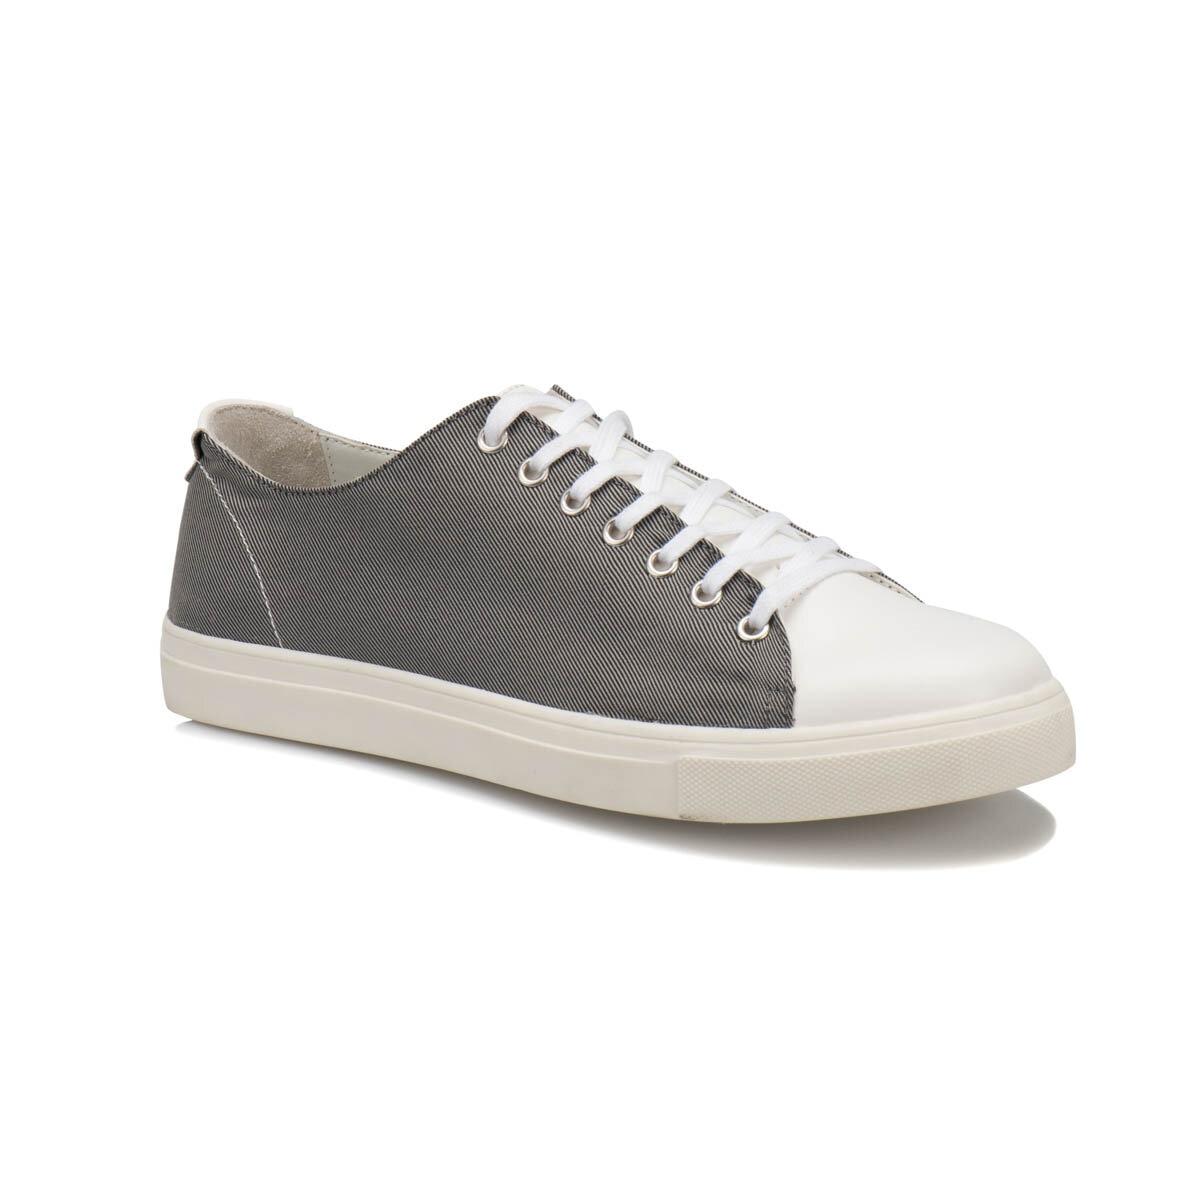 FLO 71116-2 M Gray Men 'S Sneaker Shoes Forester